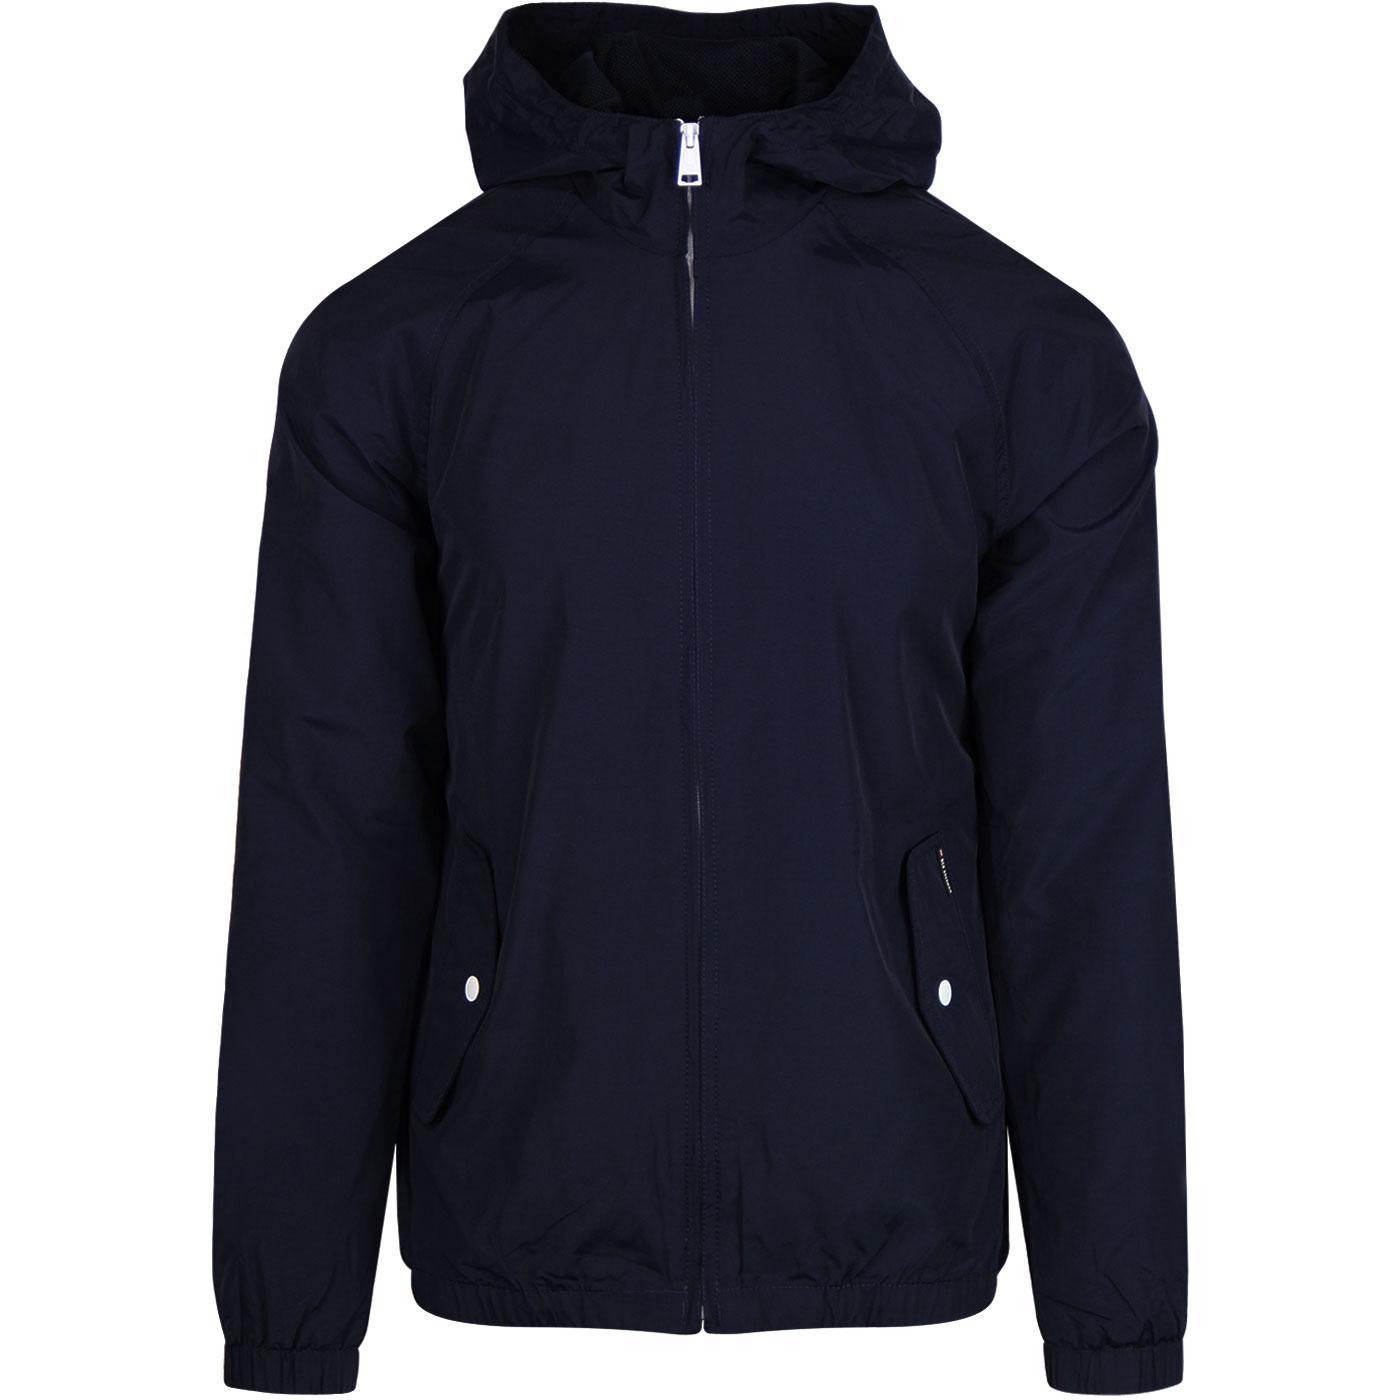 BEN SHERMAN Retro 70s Hooded Anorak Jacket (Navy)